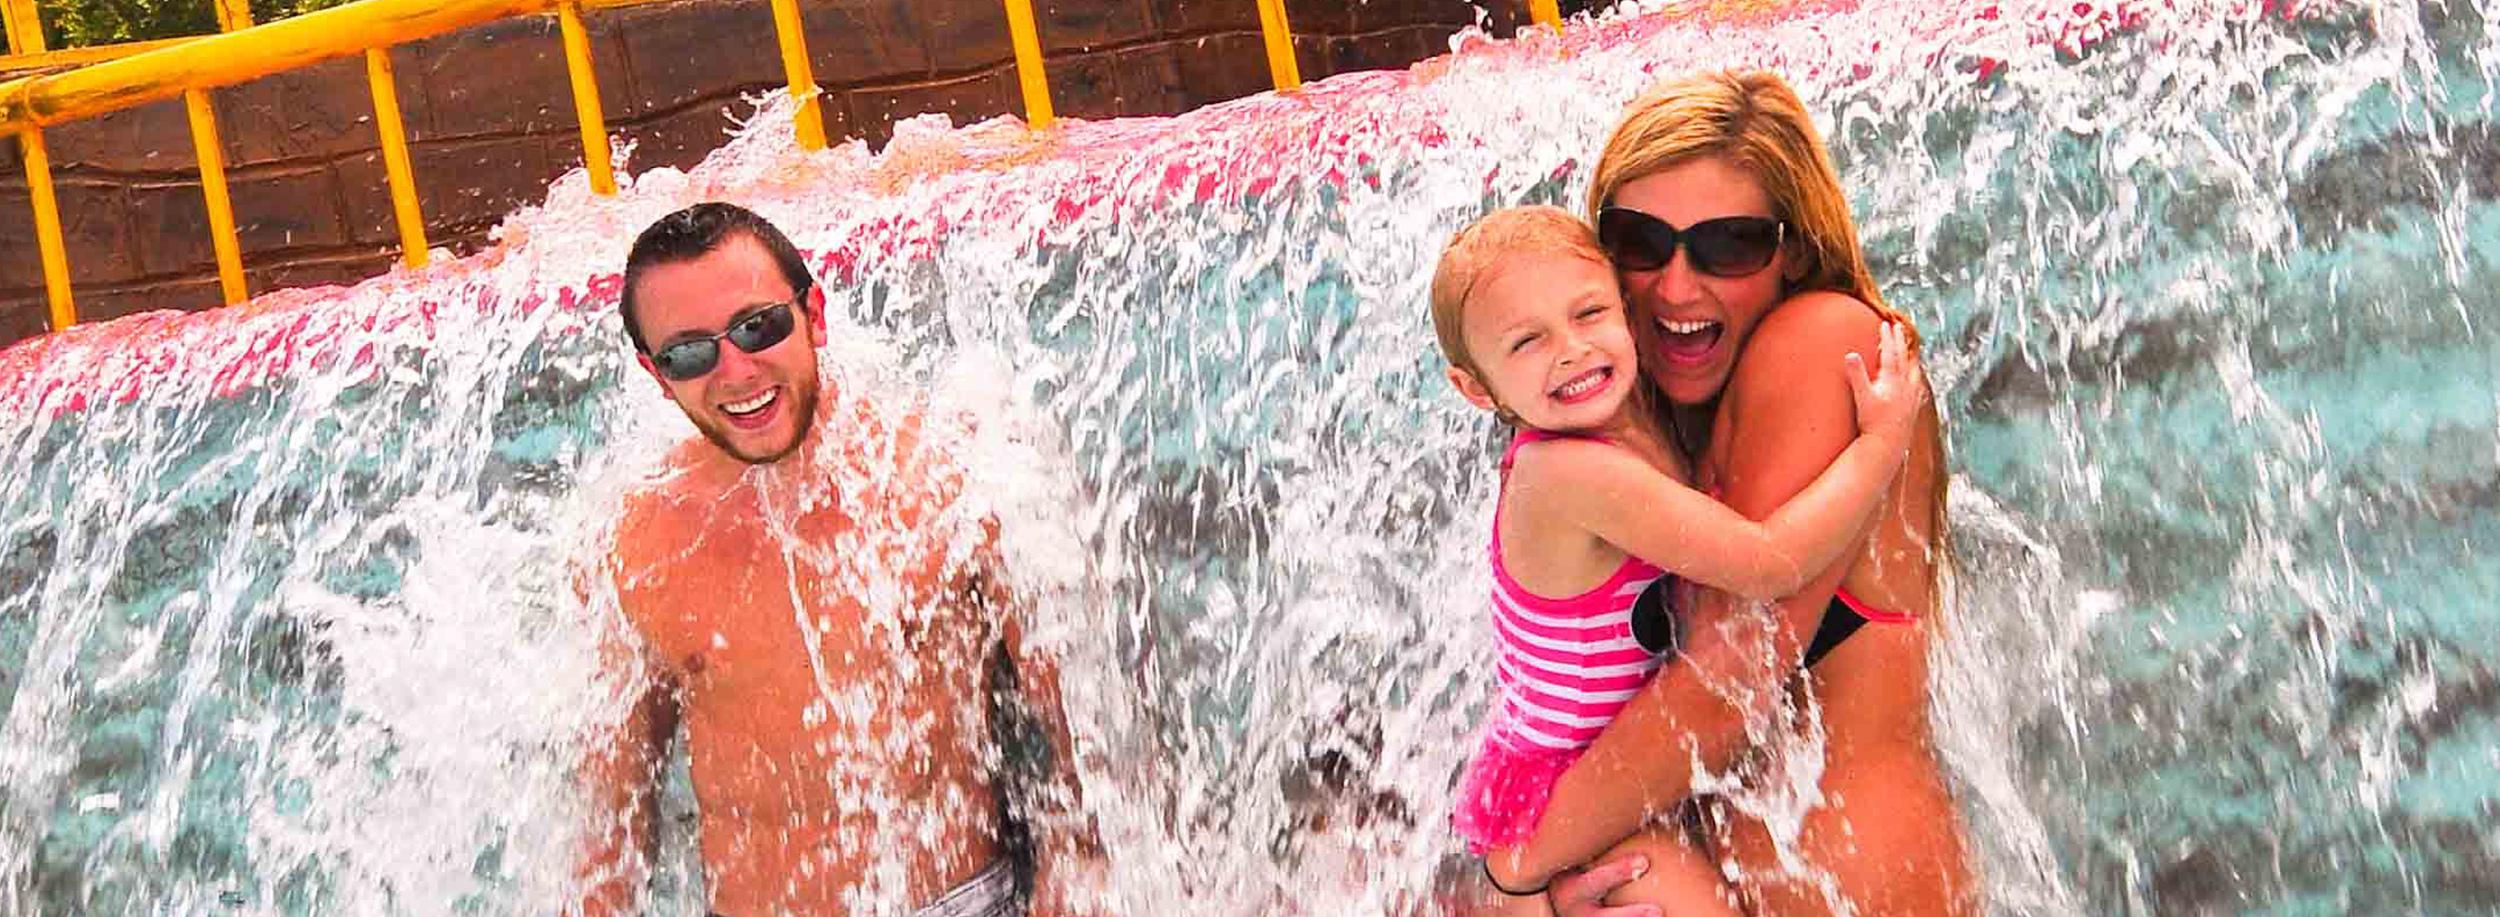 website family water fall.jpg